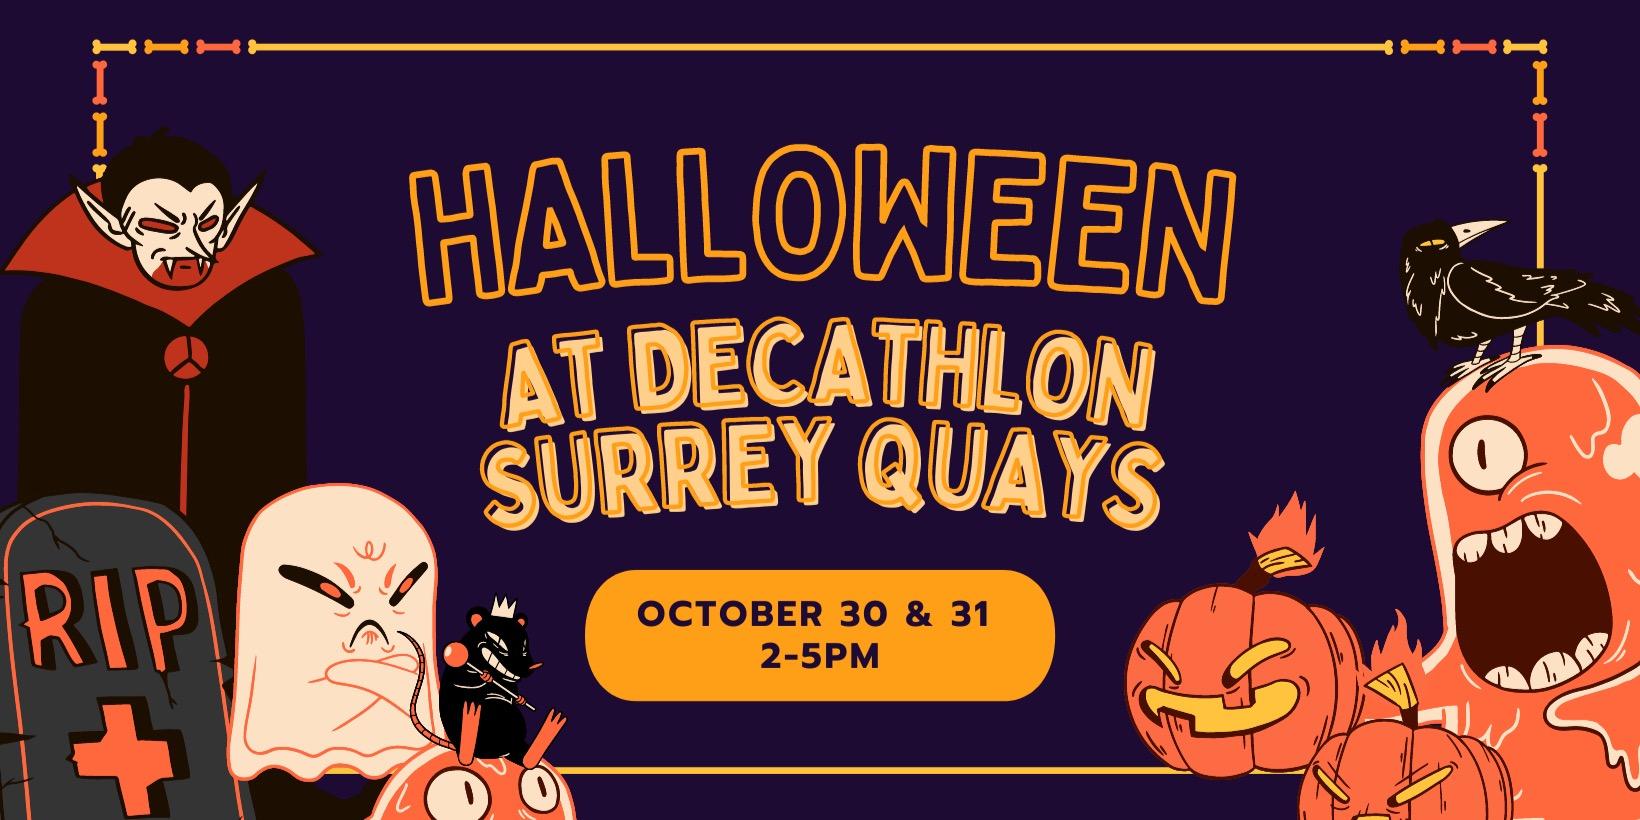 Halloween at Decathlon Surrey Quays